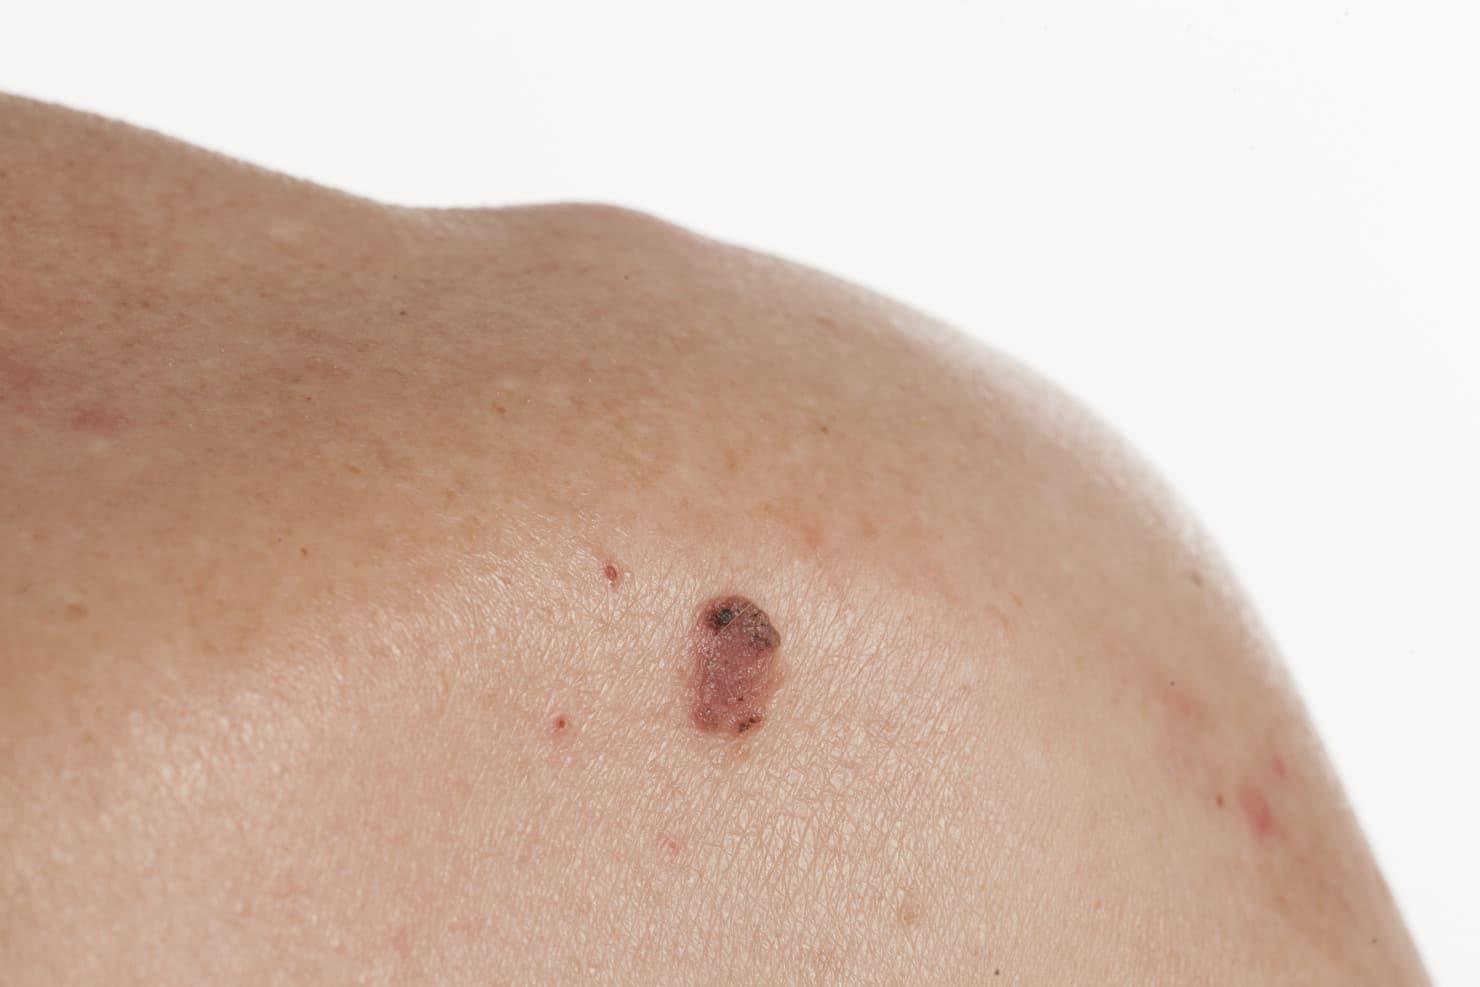 rak podstawnokomórkowy basal cell carcinoma